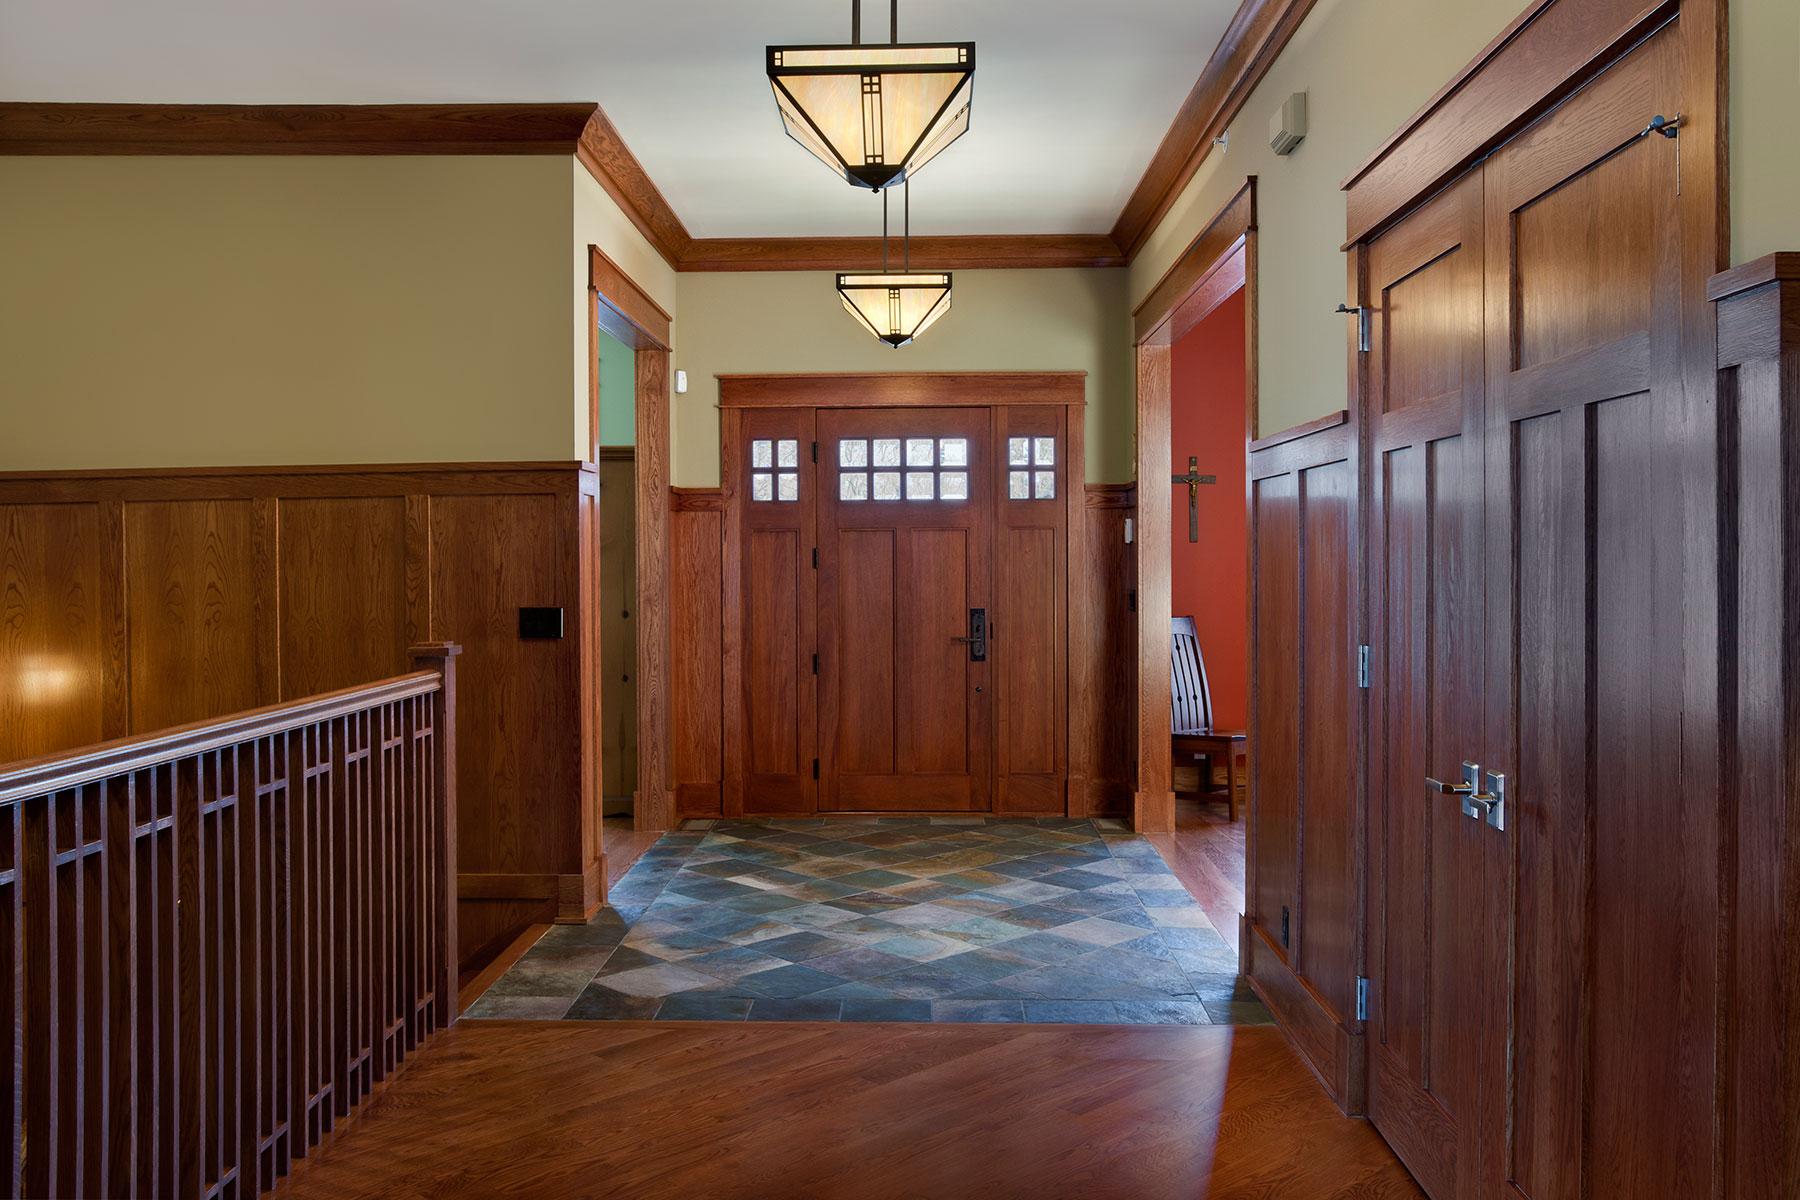 Custom Wood Front Entry Doors | Craftsman Style Custom Interior Wood Doors DB-311 2SL CST - Glenview Doors - Custom Doors in Chicago